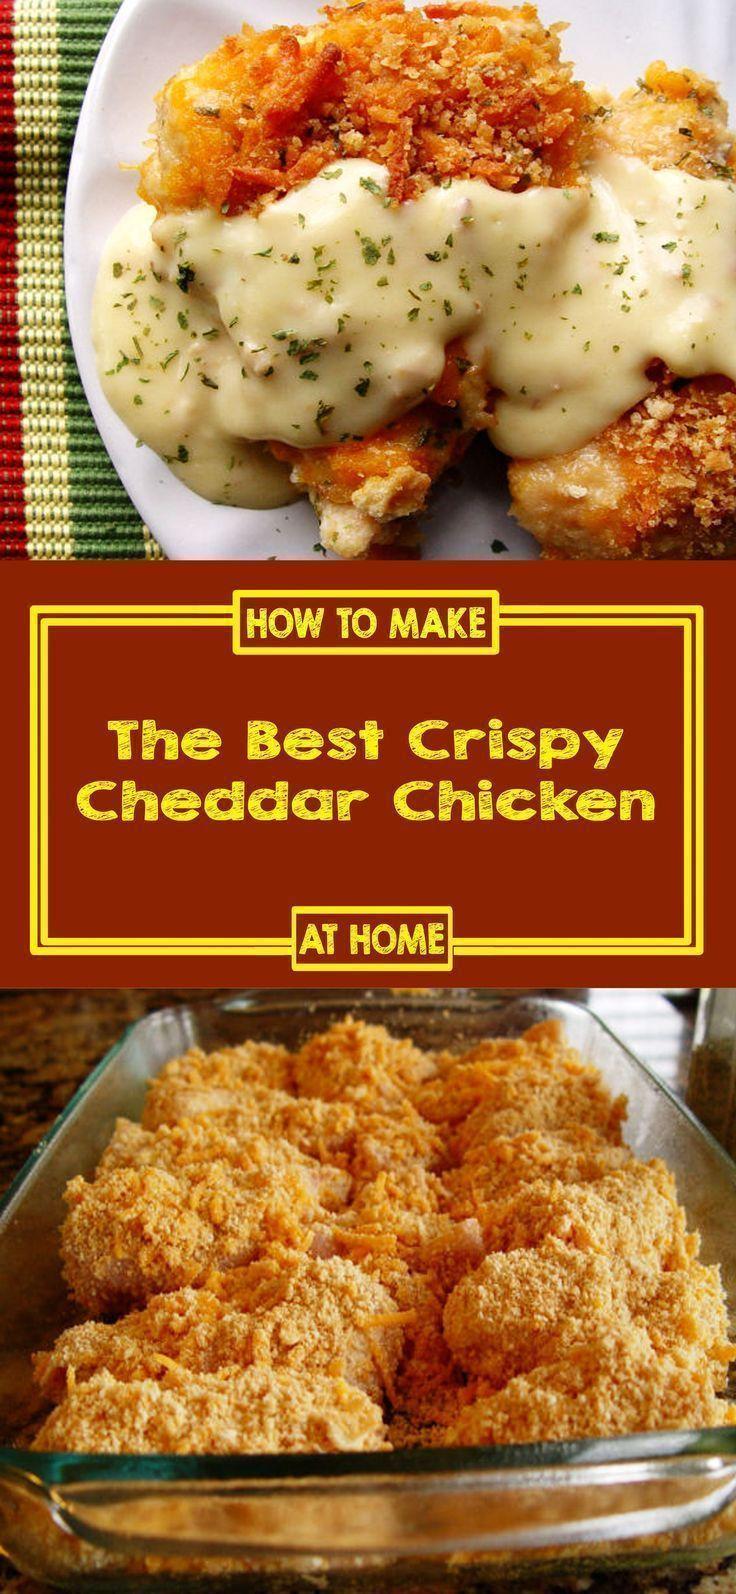 The Best Crispy Cheddar Chicken #crispycheddarchicken The Best Crispy Cheddar Chicken #crispycheddarchicken The Best Crispy Cheddar Chicken #crispycheddarchicken The Best Crispy Cheddar Chicken #crispycheddarchicken The Best Crispy Cheddar Chicken #crispycheddarchicken The Best Crispy Cheddar Chicken #crispycheddarchicken The Best Crispy Cheddar Chicken #crispycheddarchicken The Best Crispy Cheddar Chicken #crispycheddarchicken The Best Crispy Cheddar Chicken #crispycheddarchicken The Best Crisp #crispycheddarchicken